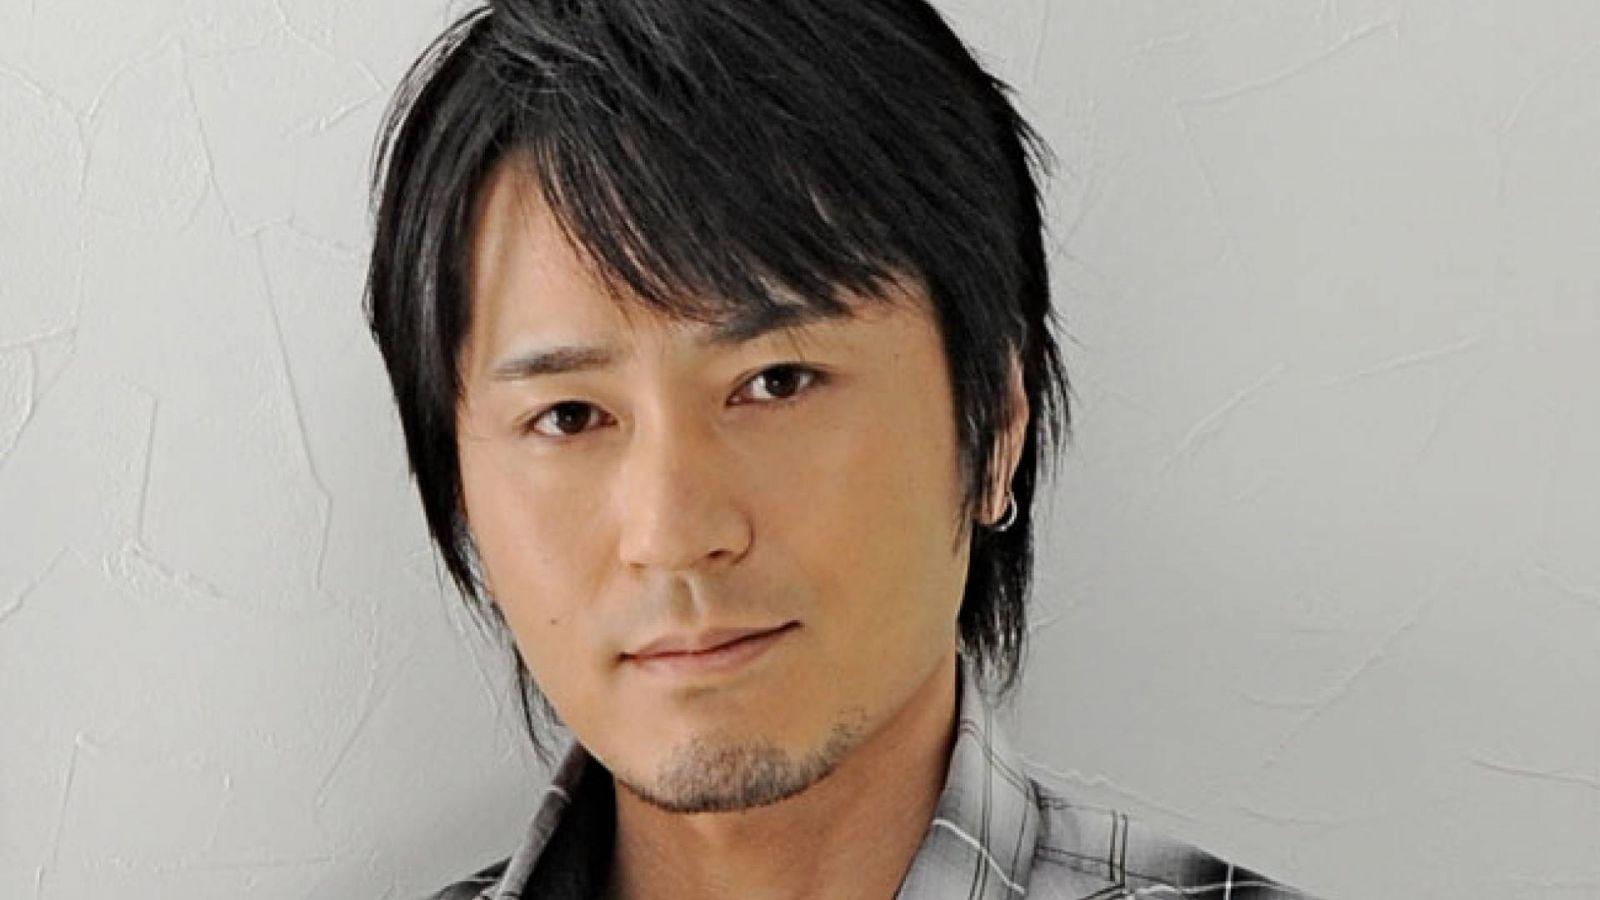 Wywiad z Tetsuyą Shibatą © Shibata Tetsuya. All rights reserved.